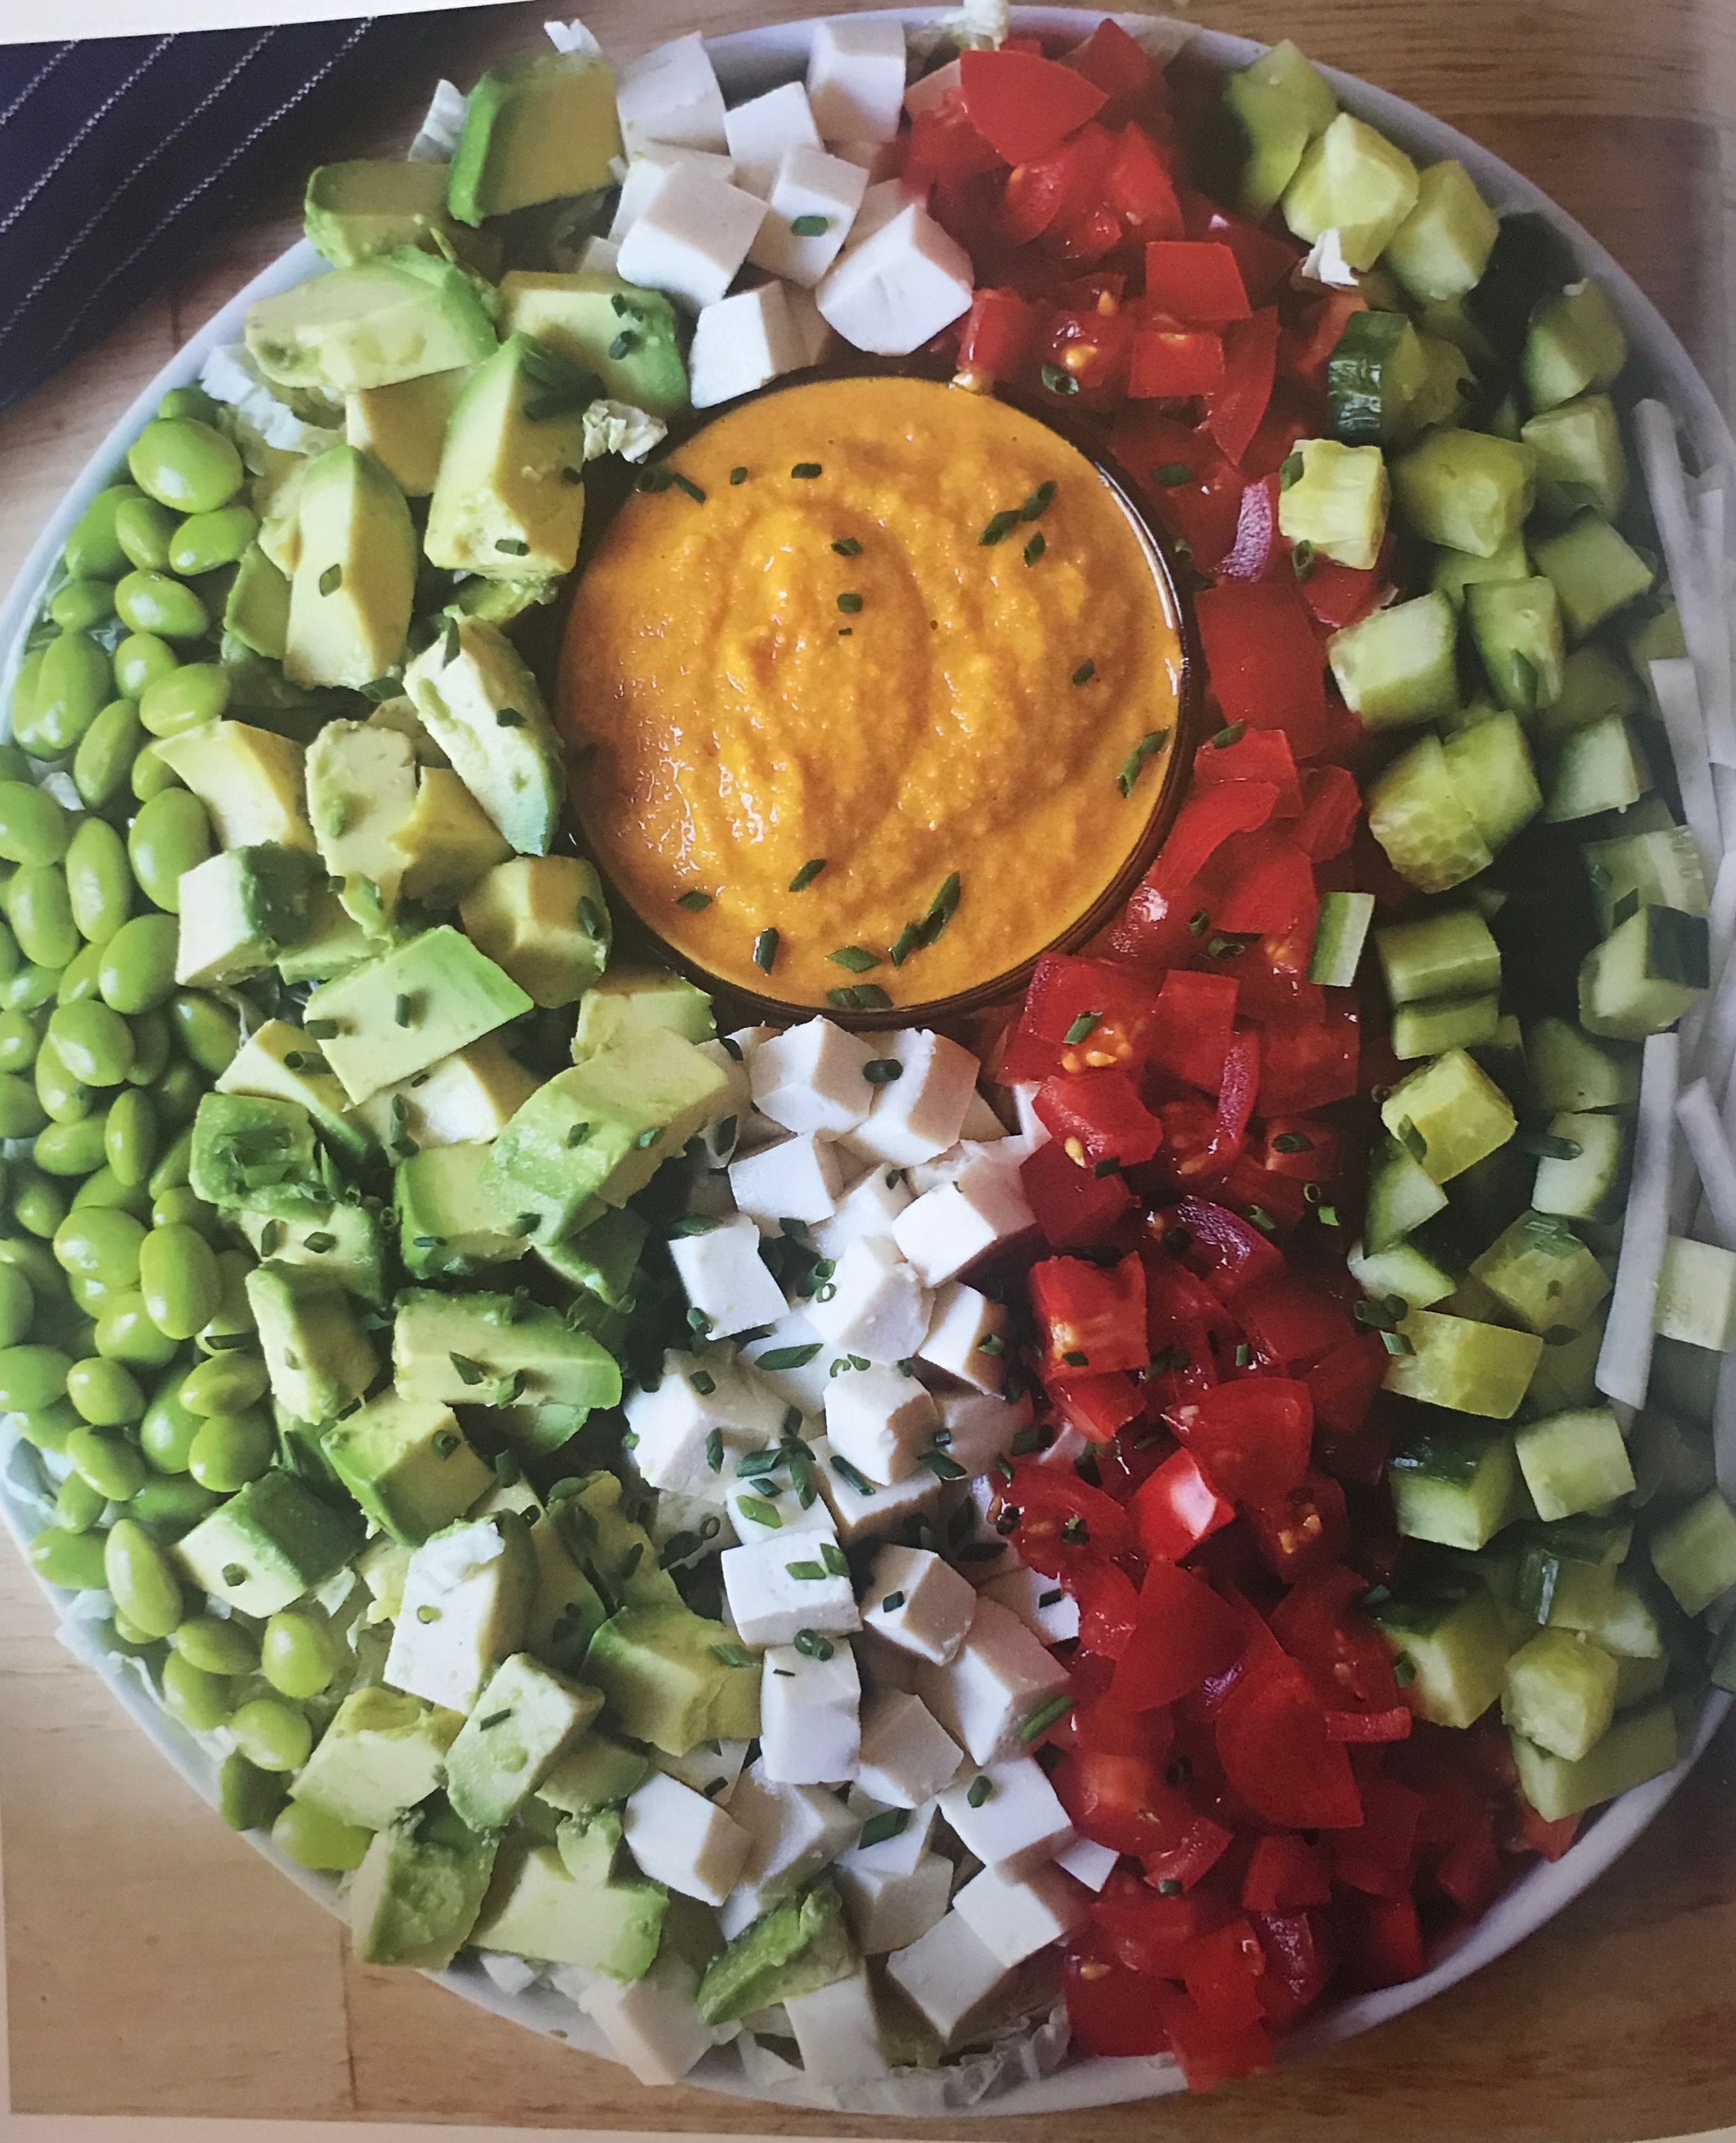 Smitten Kitchen Everyday Sushi Takeout Cobb Salads